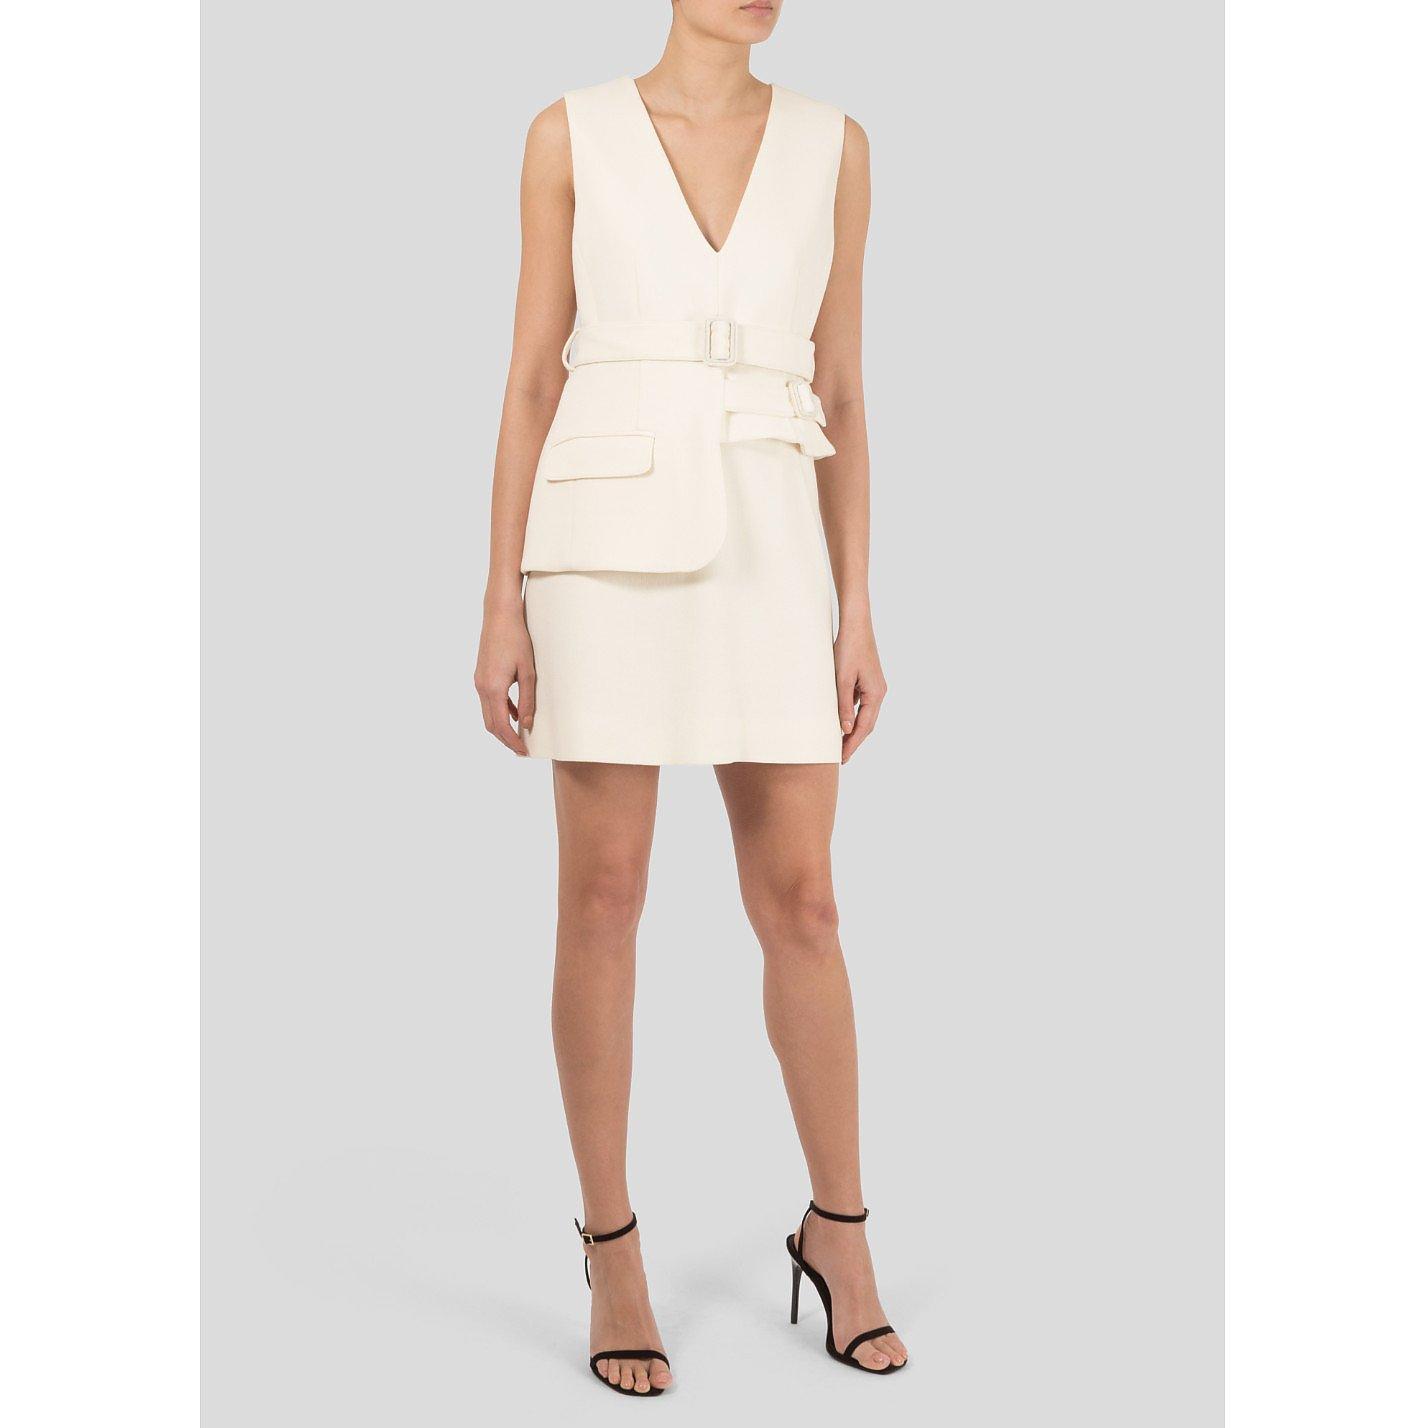 Victoria Beckham Belted Wool Mini Dress